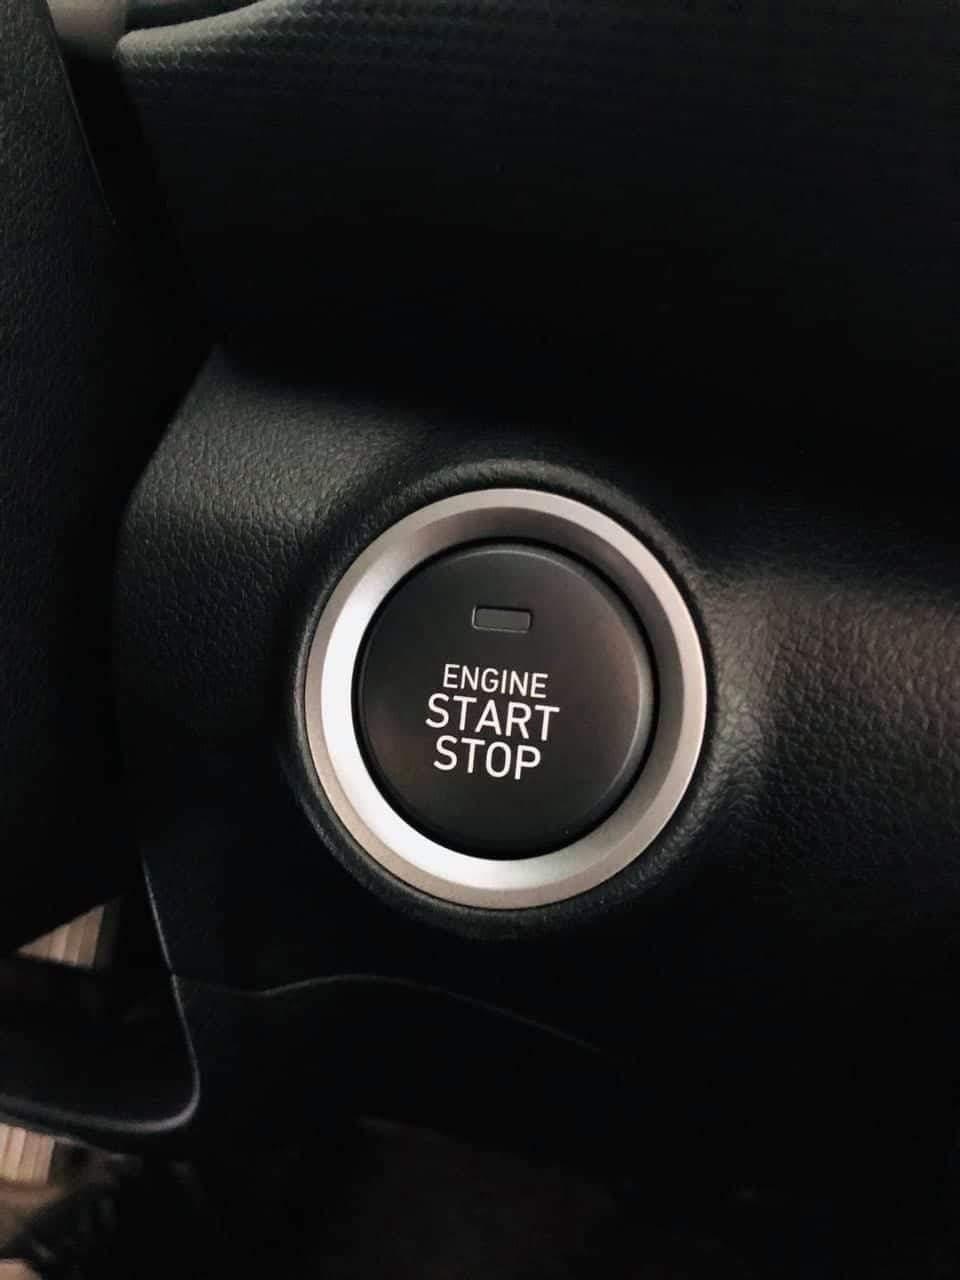 Hyundai Kona 2.0L GLS Gasoline with AVN